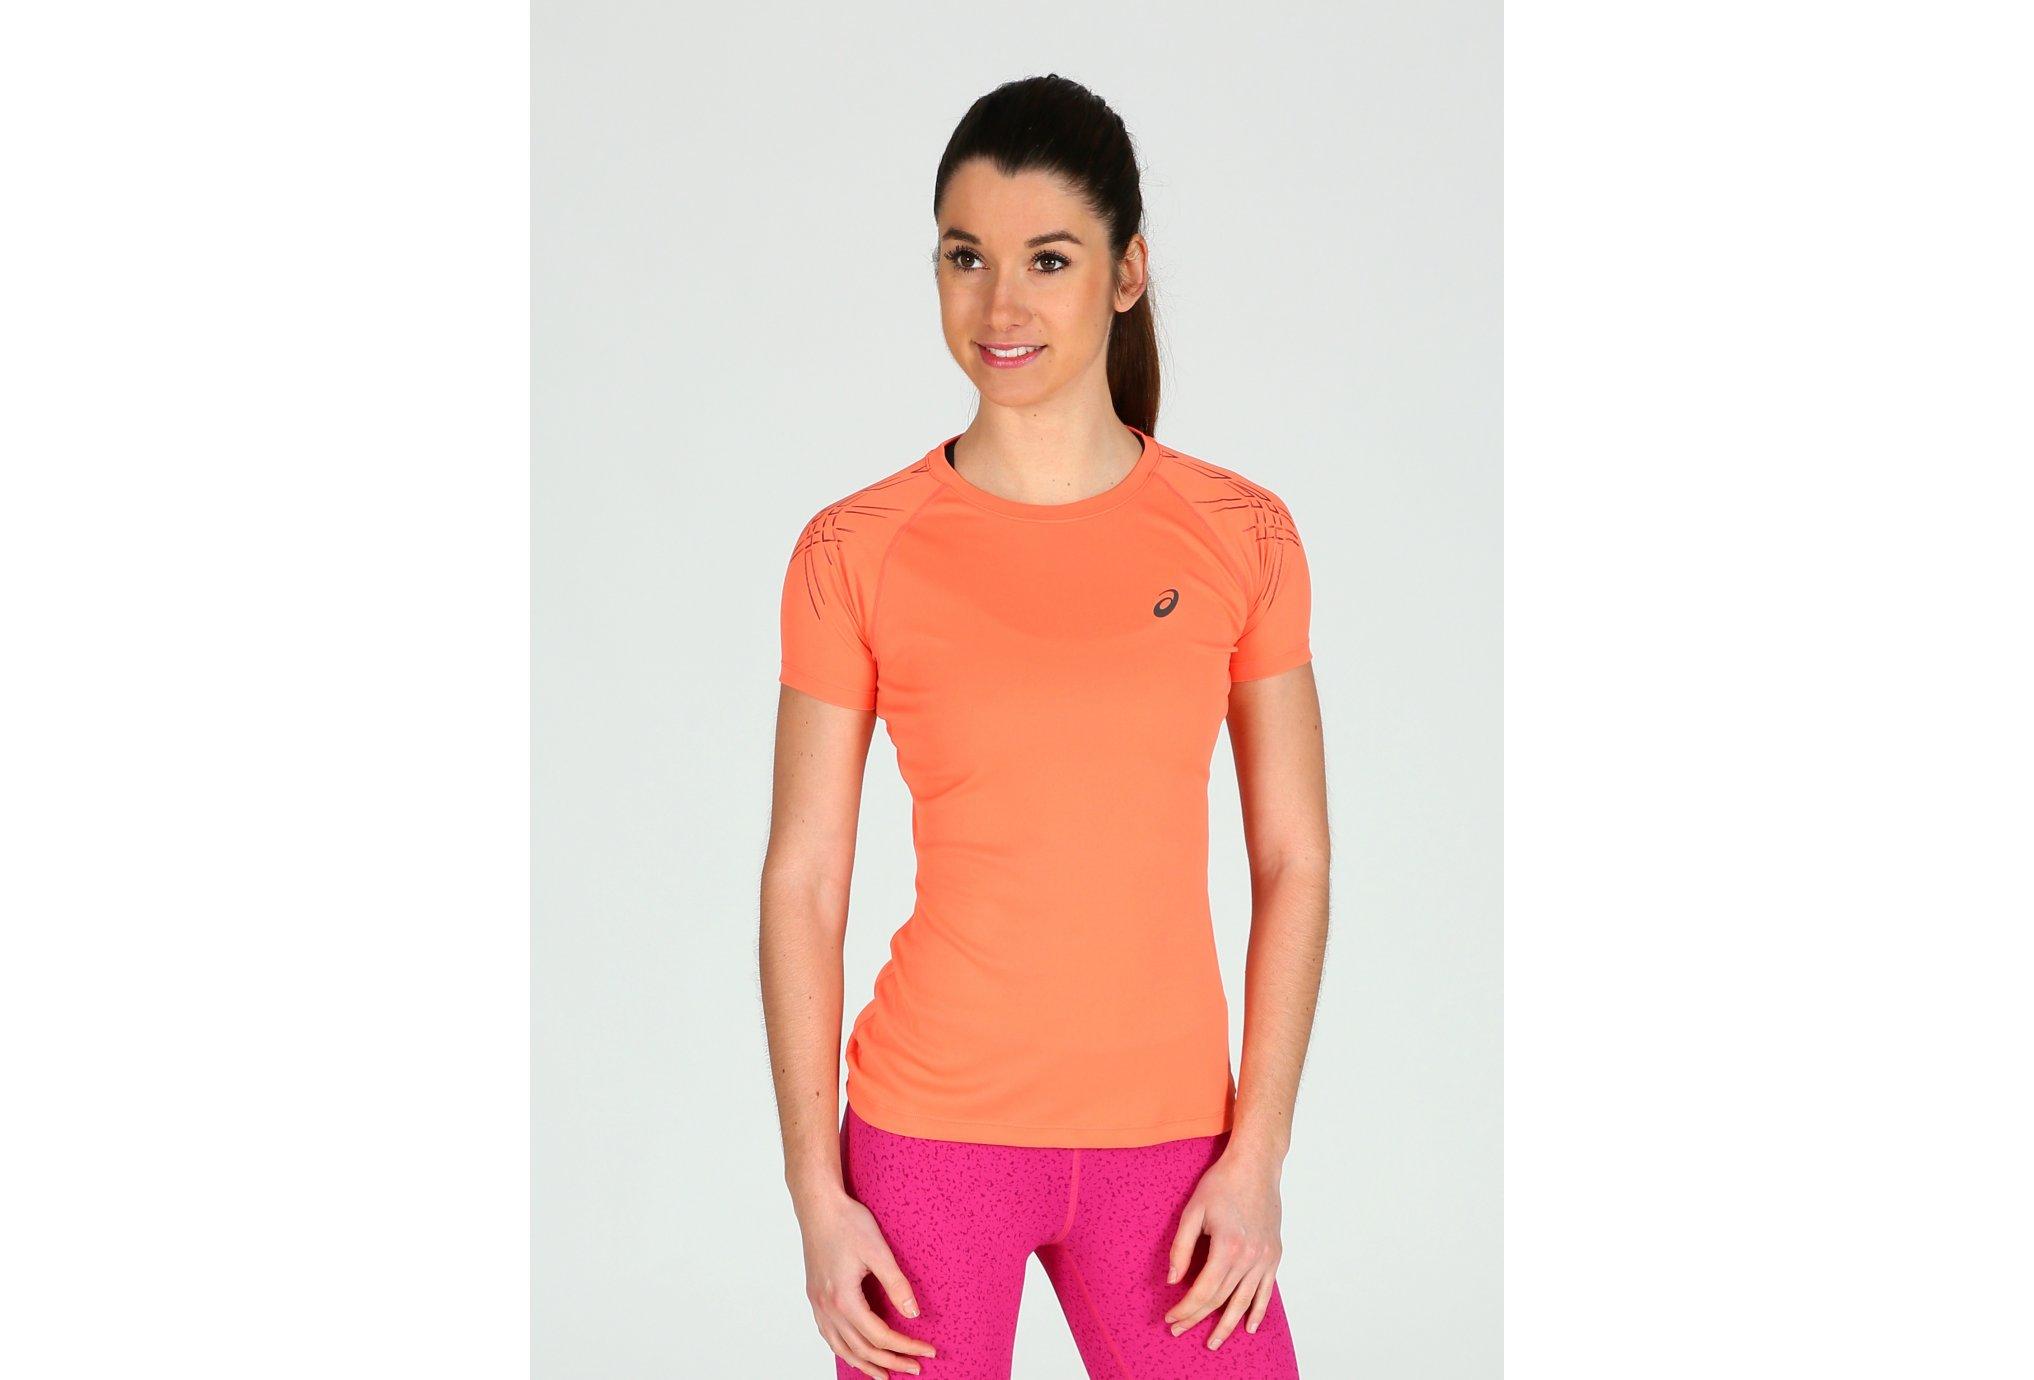 Tee Top La W Fortifiée Femme Shirt Running Vêtement Asics Stripe 8wXkOn0P